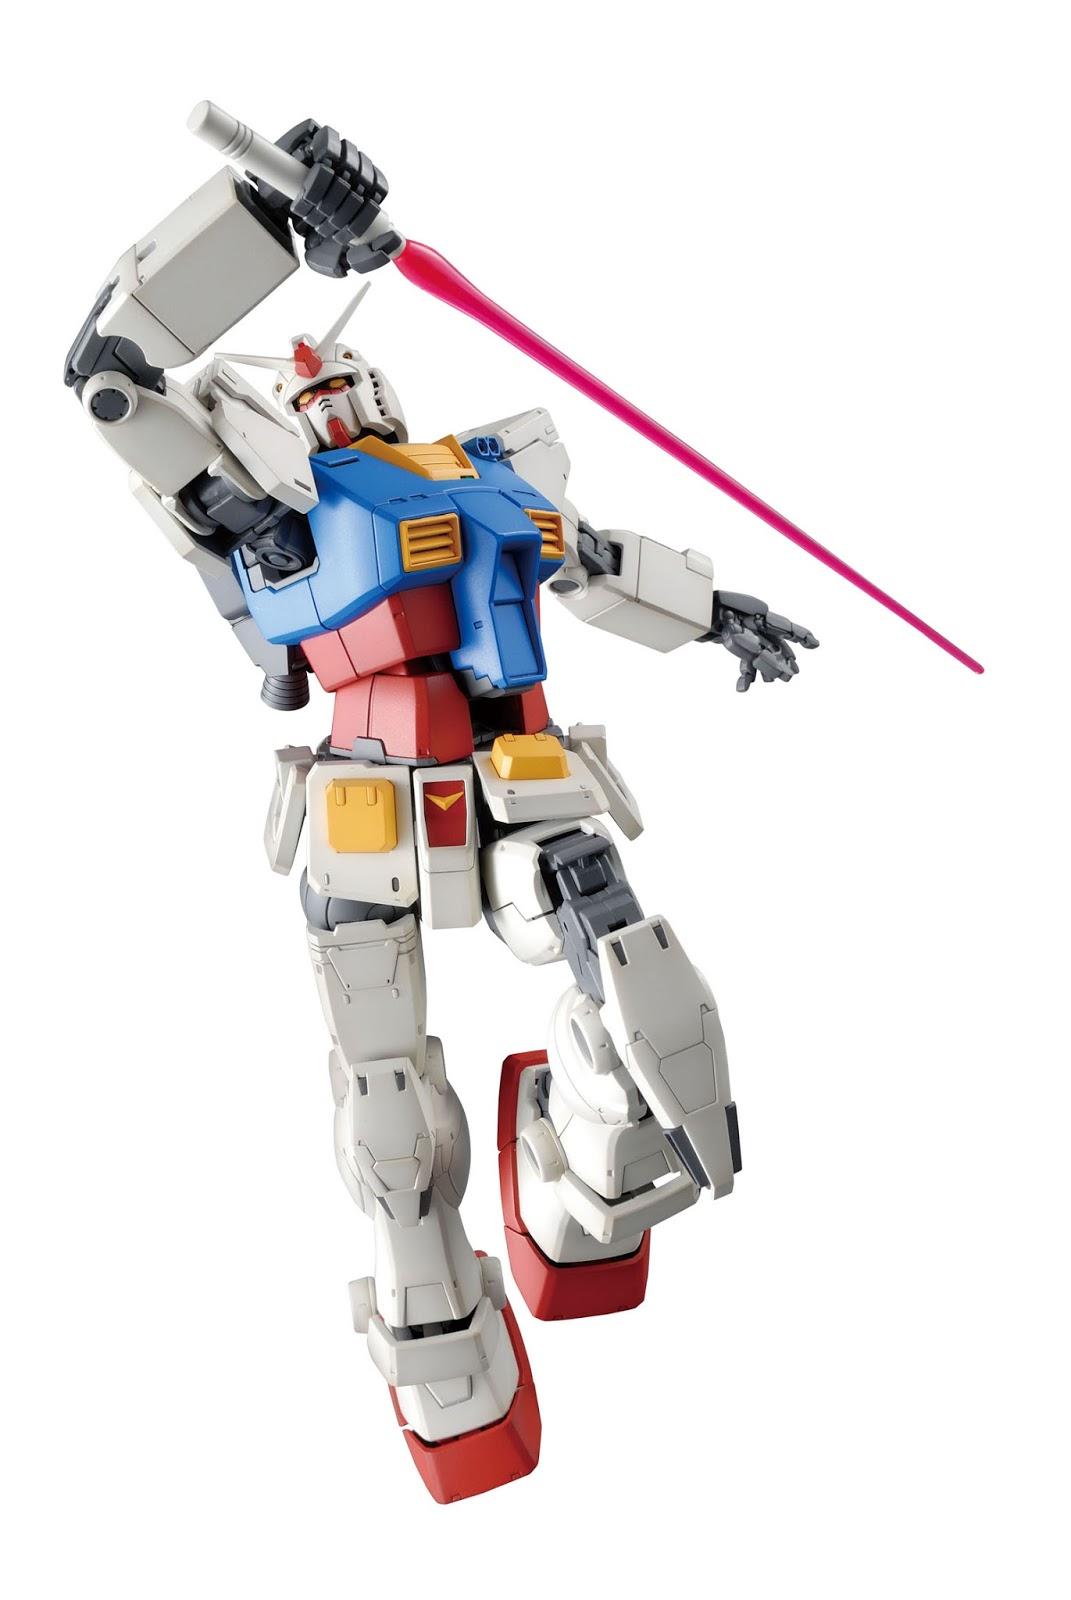 RX-78 T GUNDAM GUY: MG 1/100 RX-78-02 Gundam [Gundam THE ORIGIN] - New Images & Release Info [Updated 11/18/15]